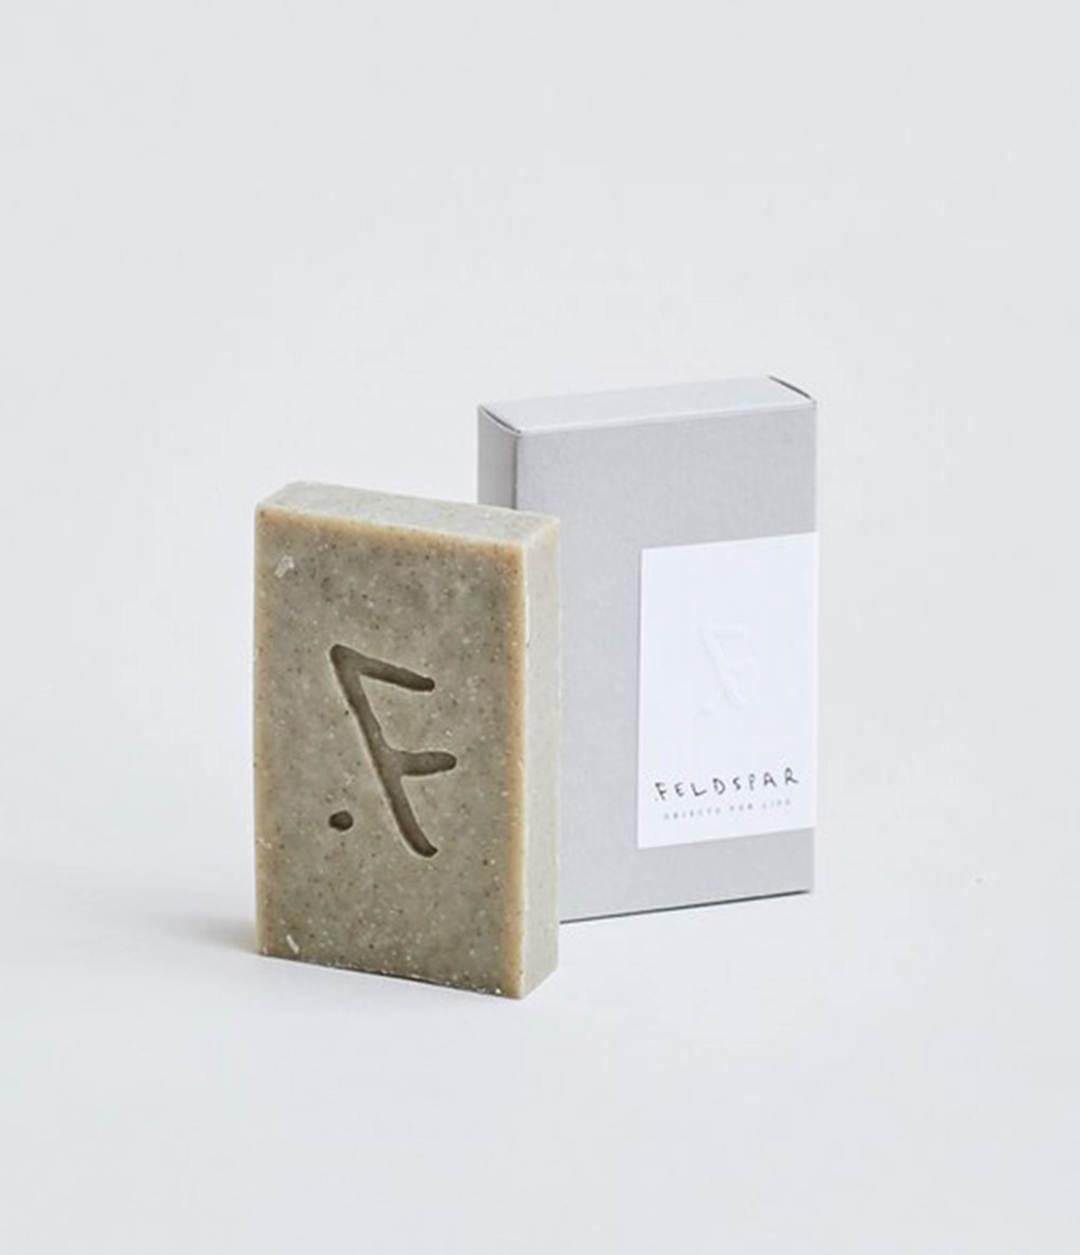 Feldspar-Kelp-Soap-and-packaging